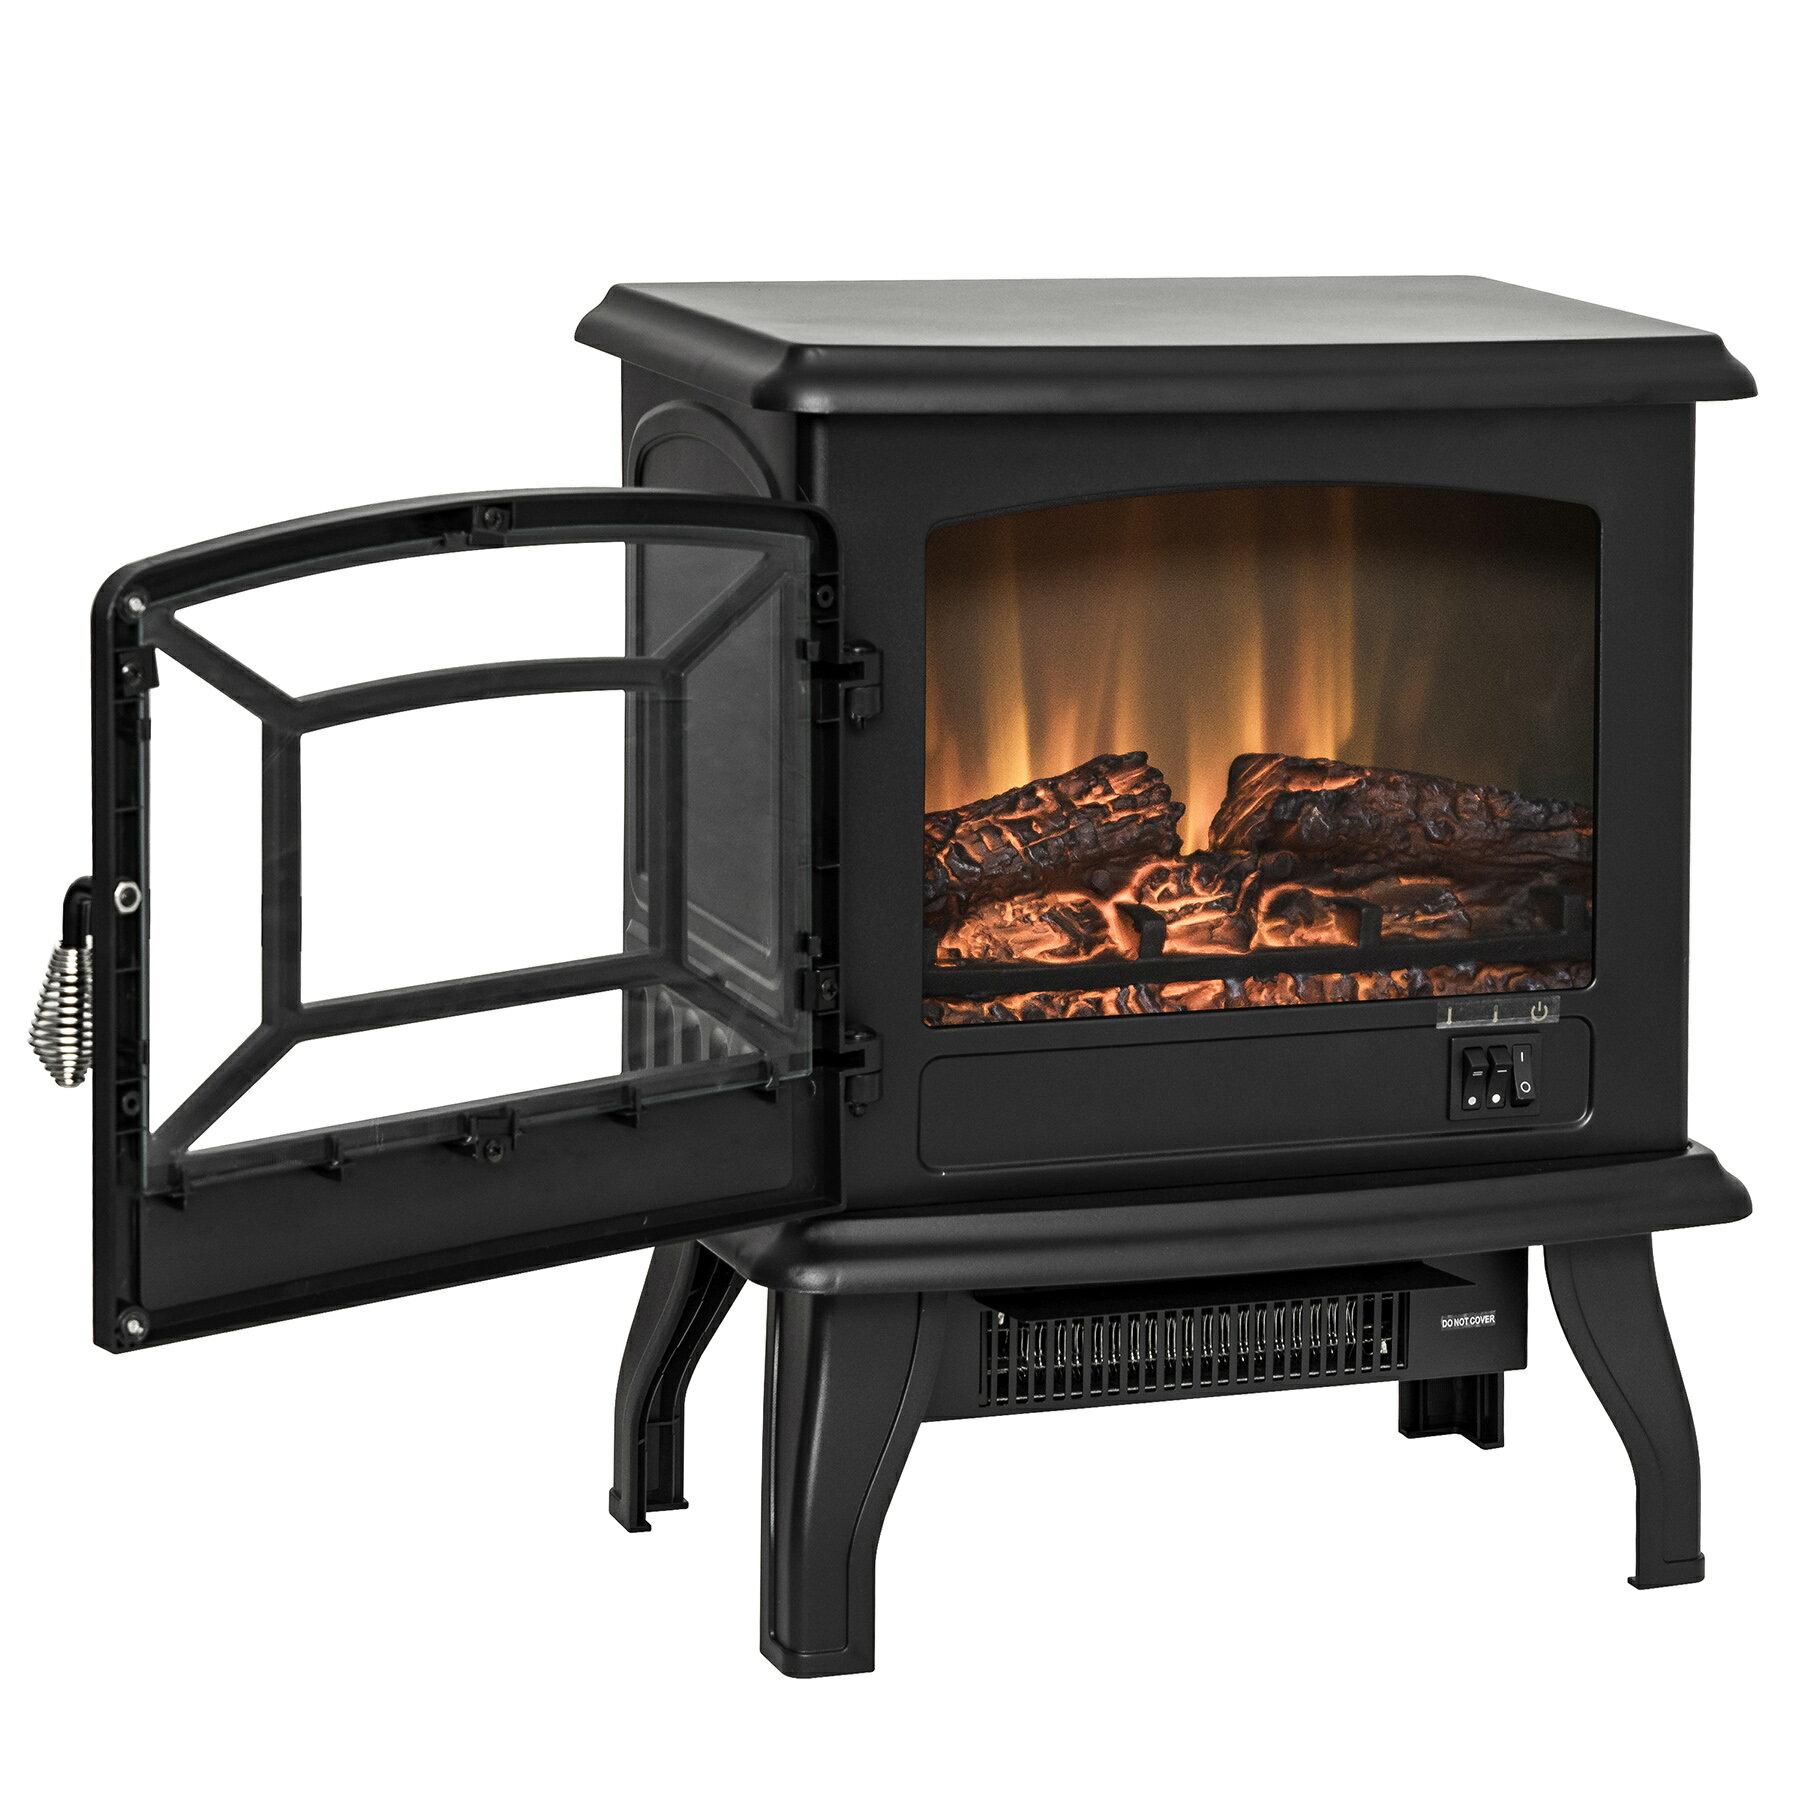 "AKDY 17"" Black Finish Freestanding Portable Electric Fireplace Heater 2 Setting Level 2"